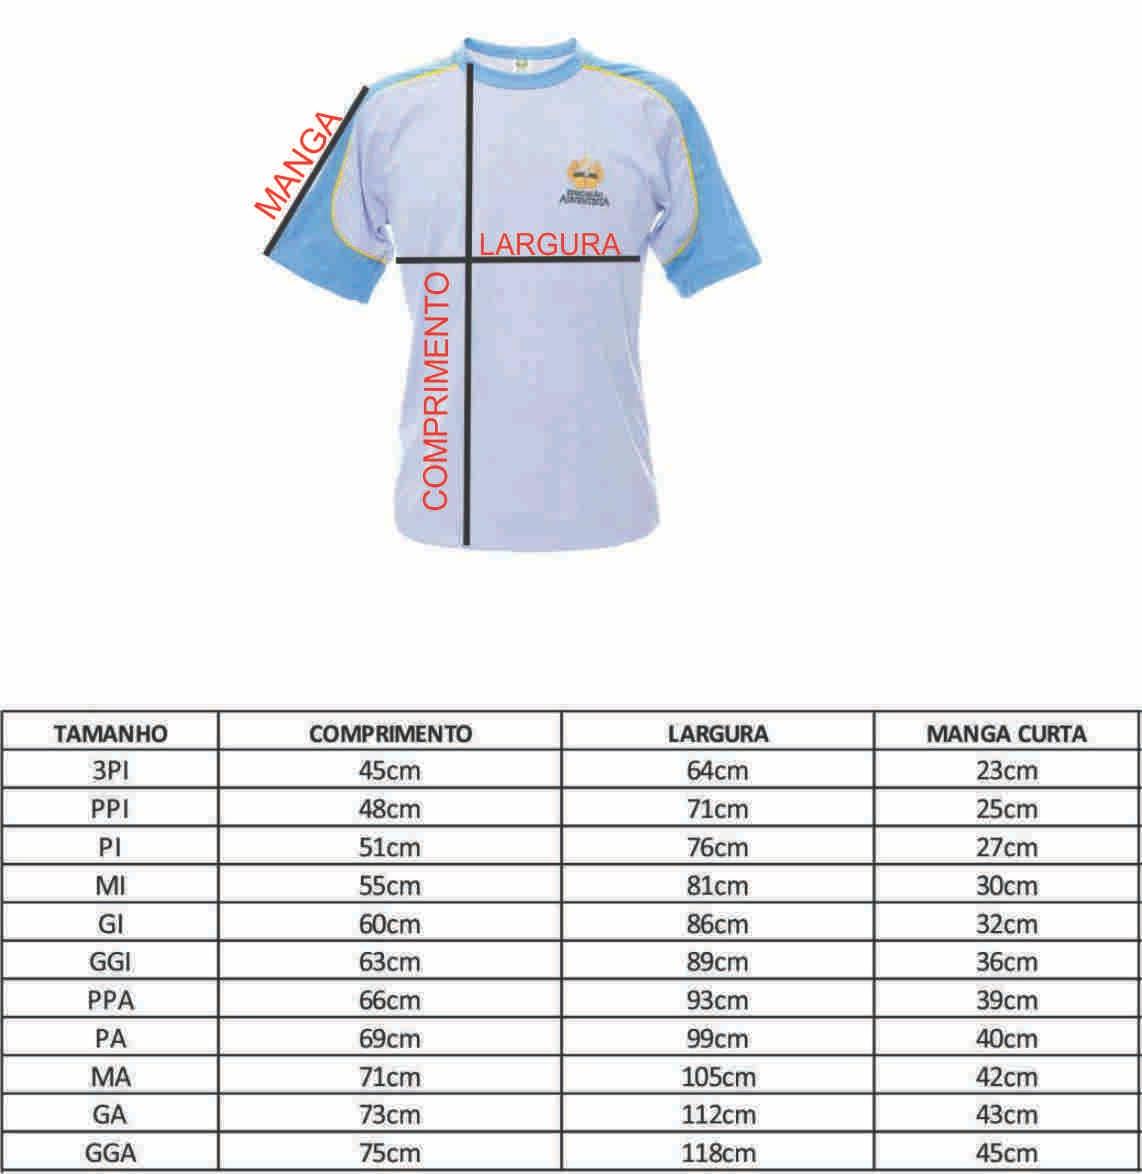 Camiseta Manga Curta - GI ( 14-36 )